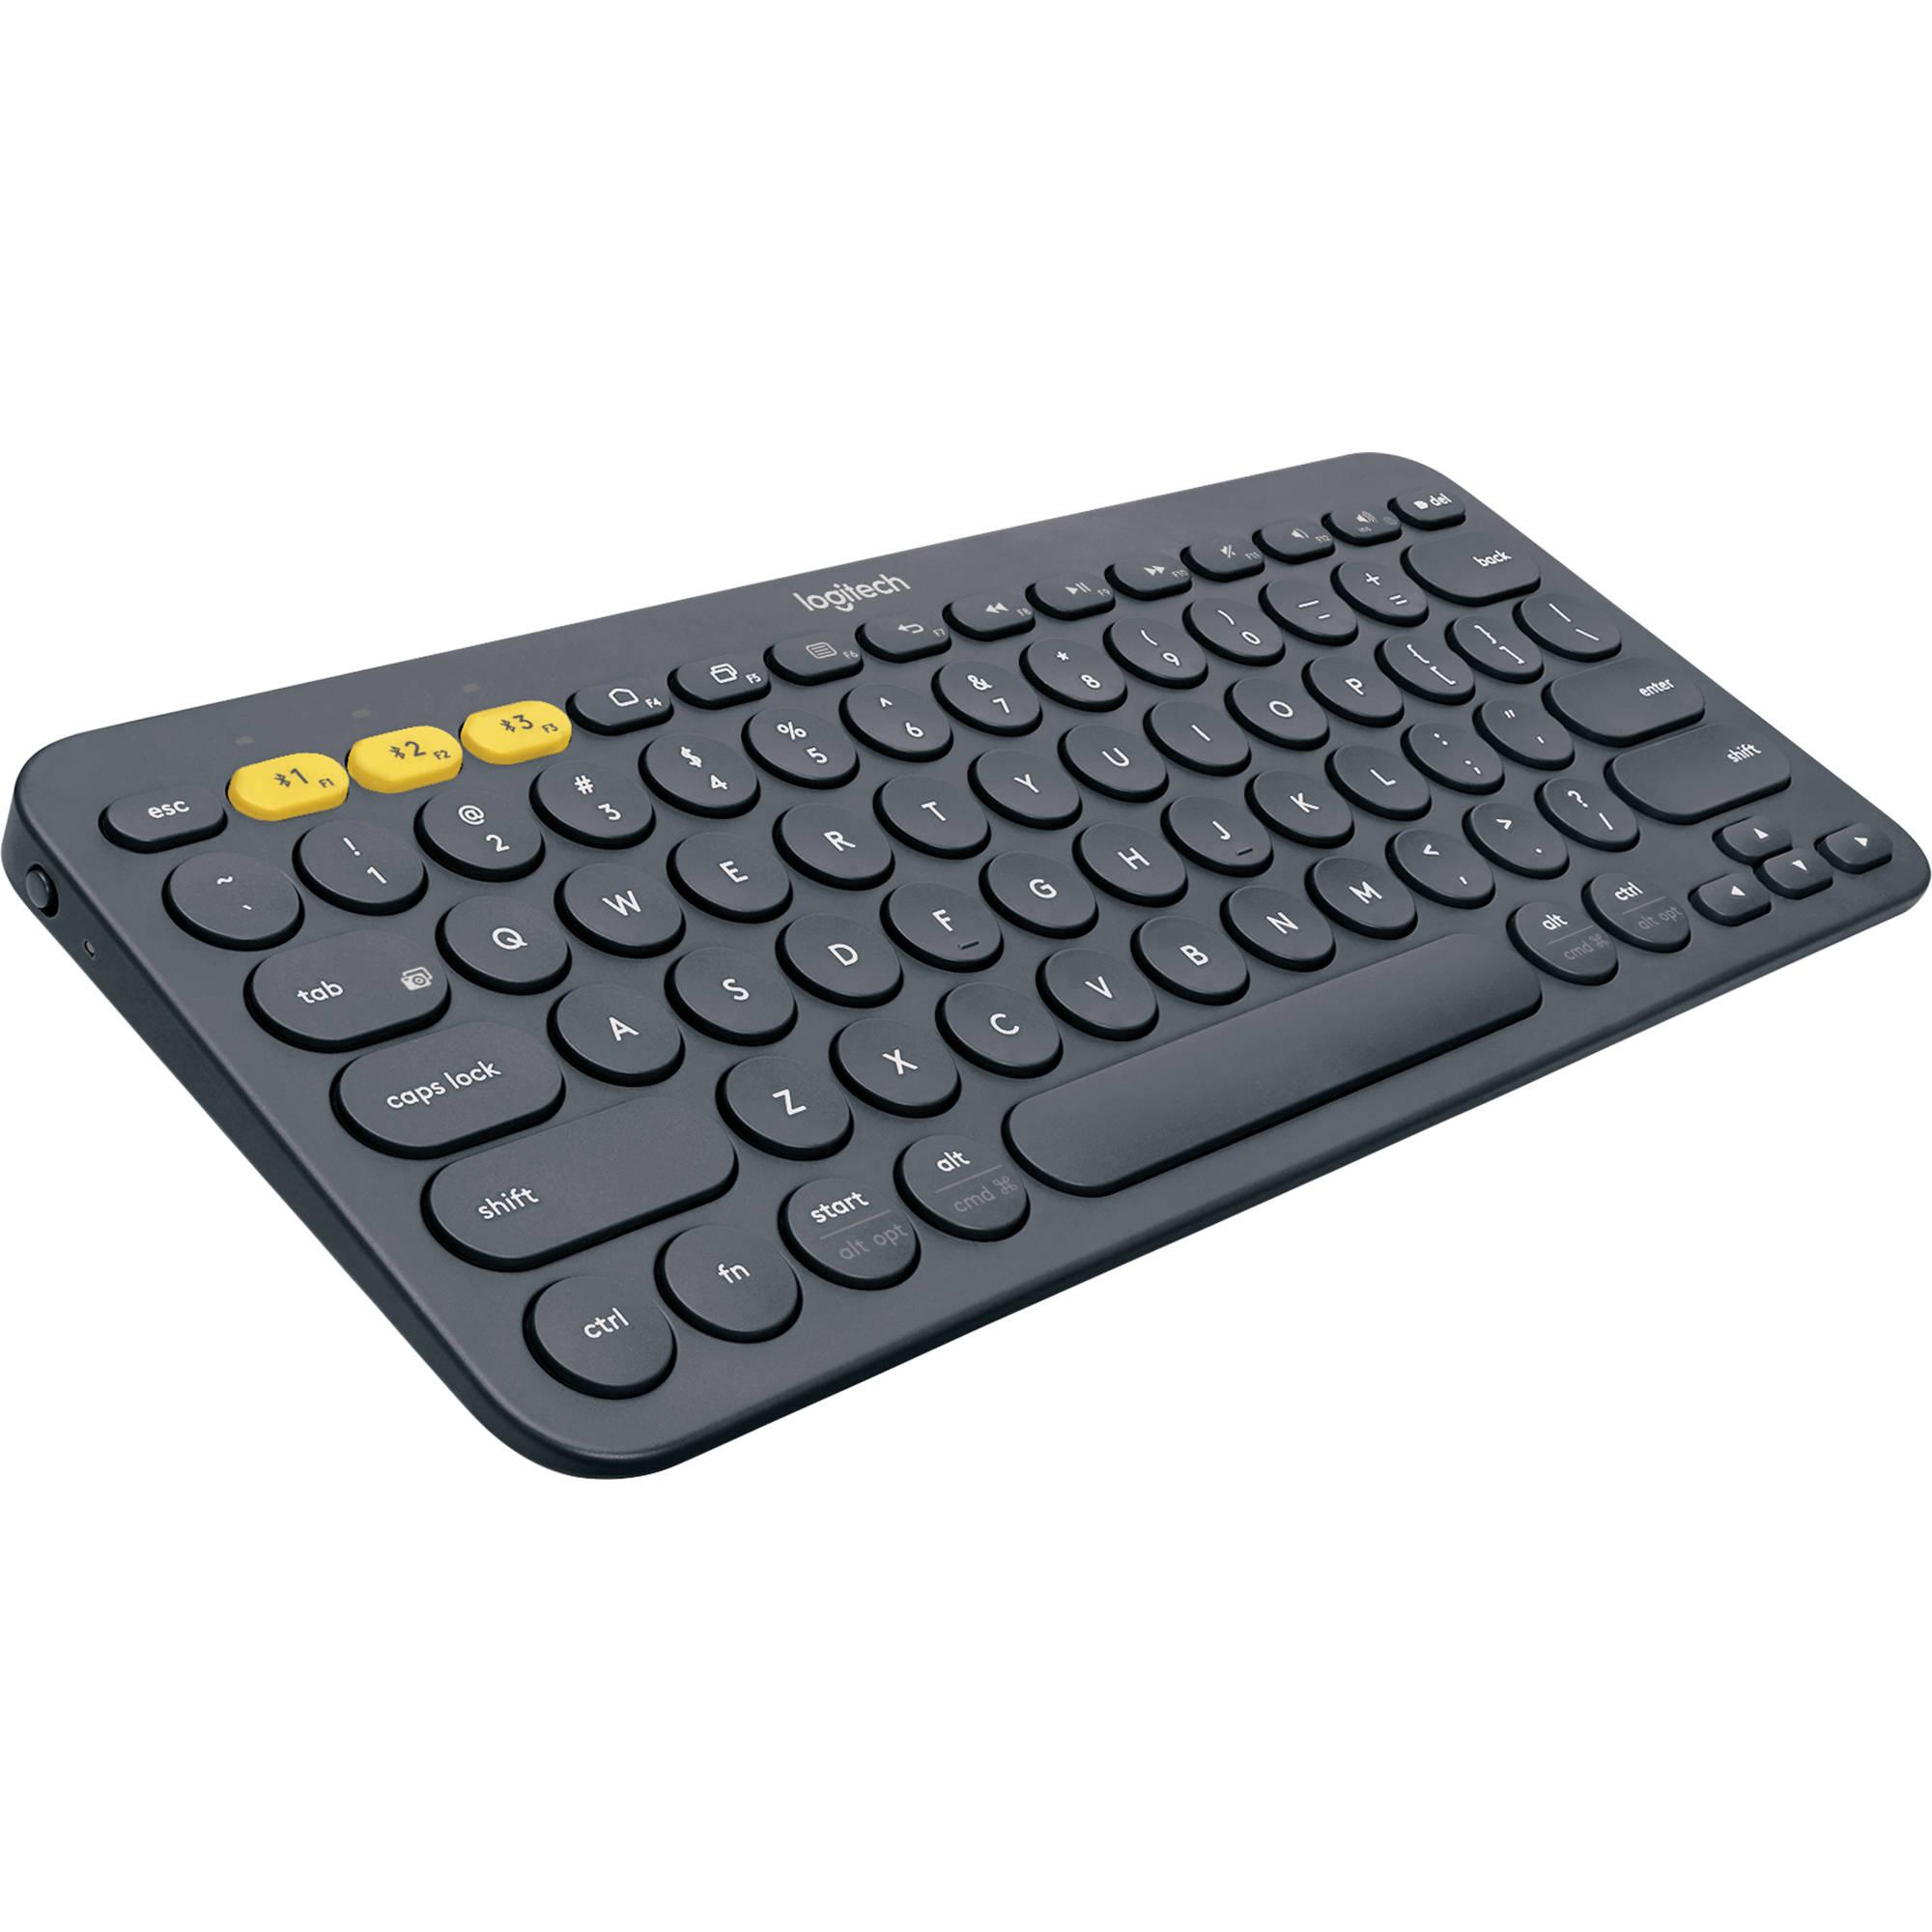 Logitech K380 Bluetooth Keyboard Black 920 007558 B H Photo